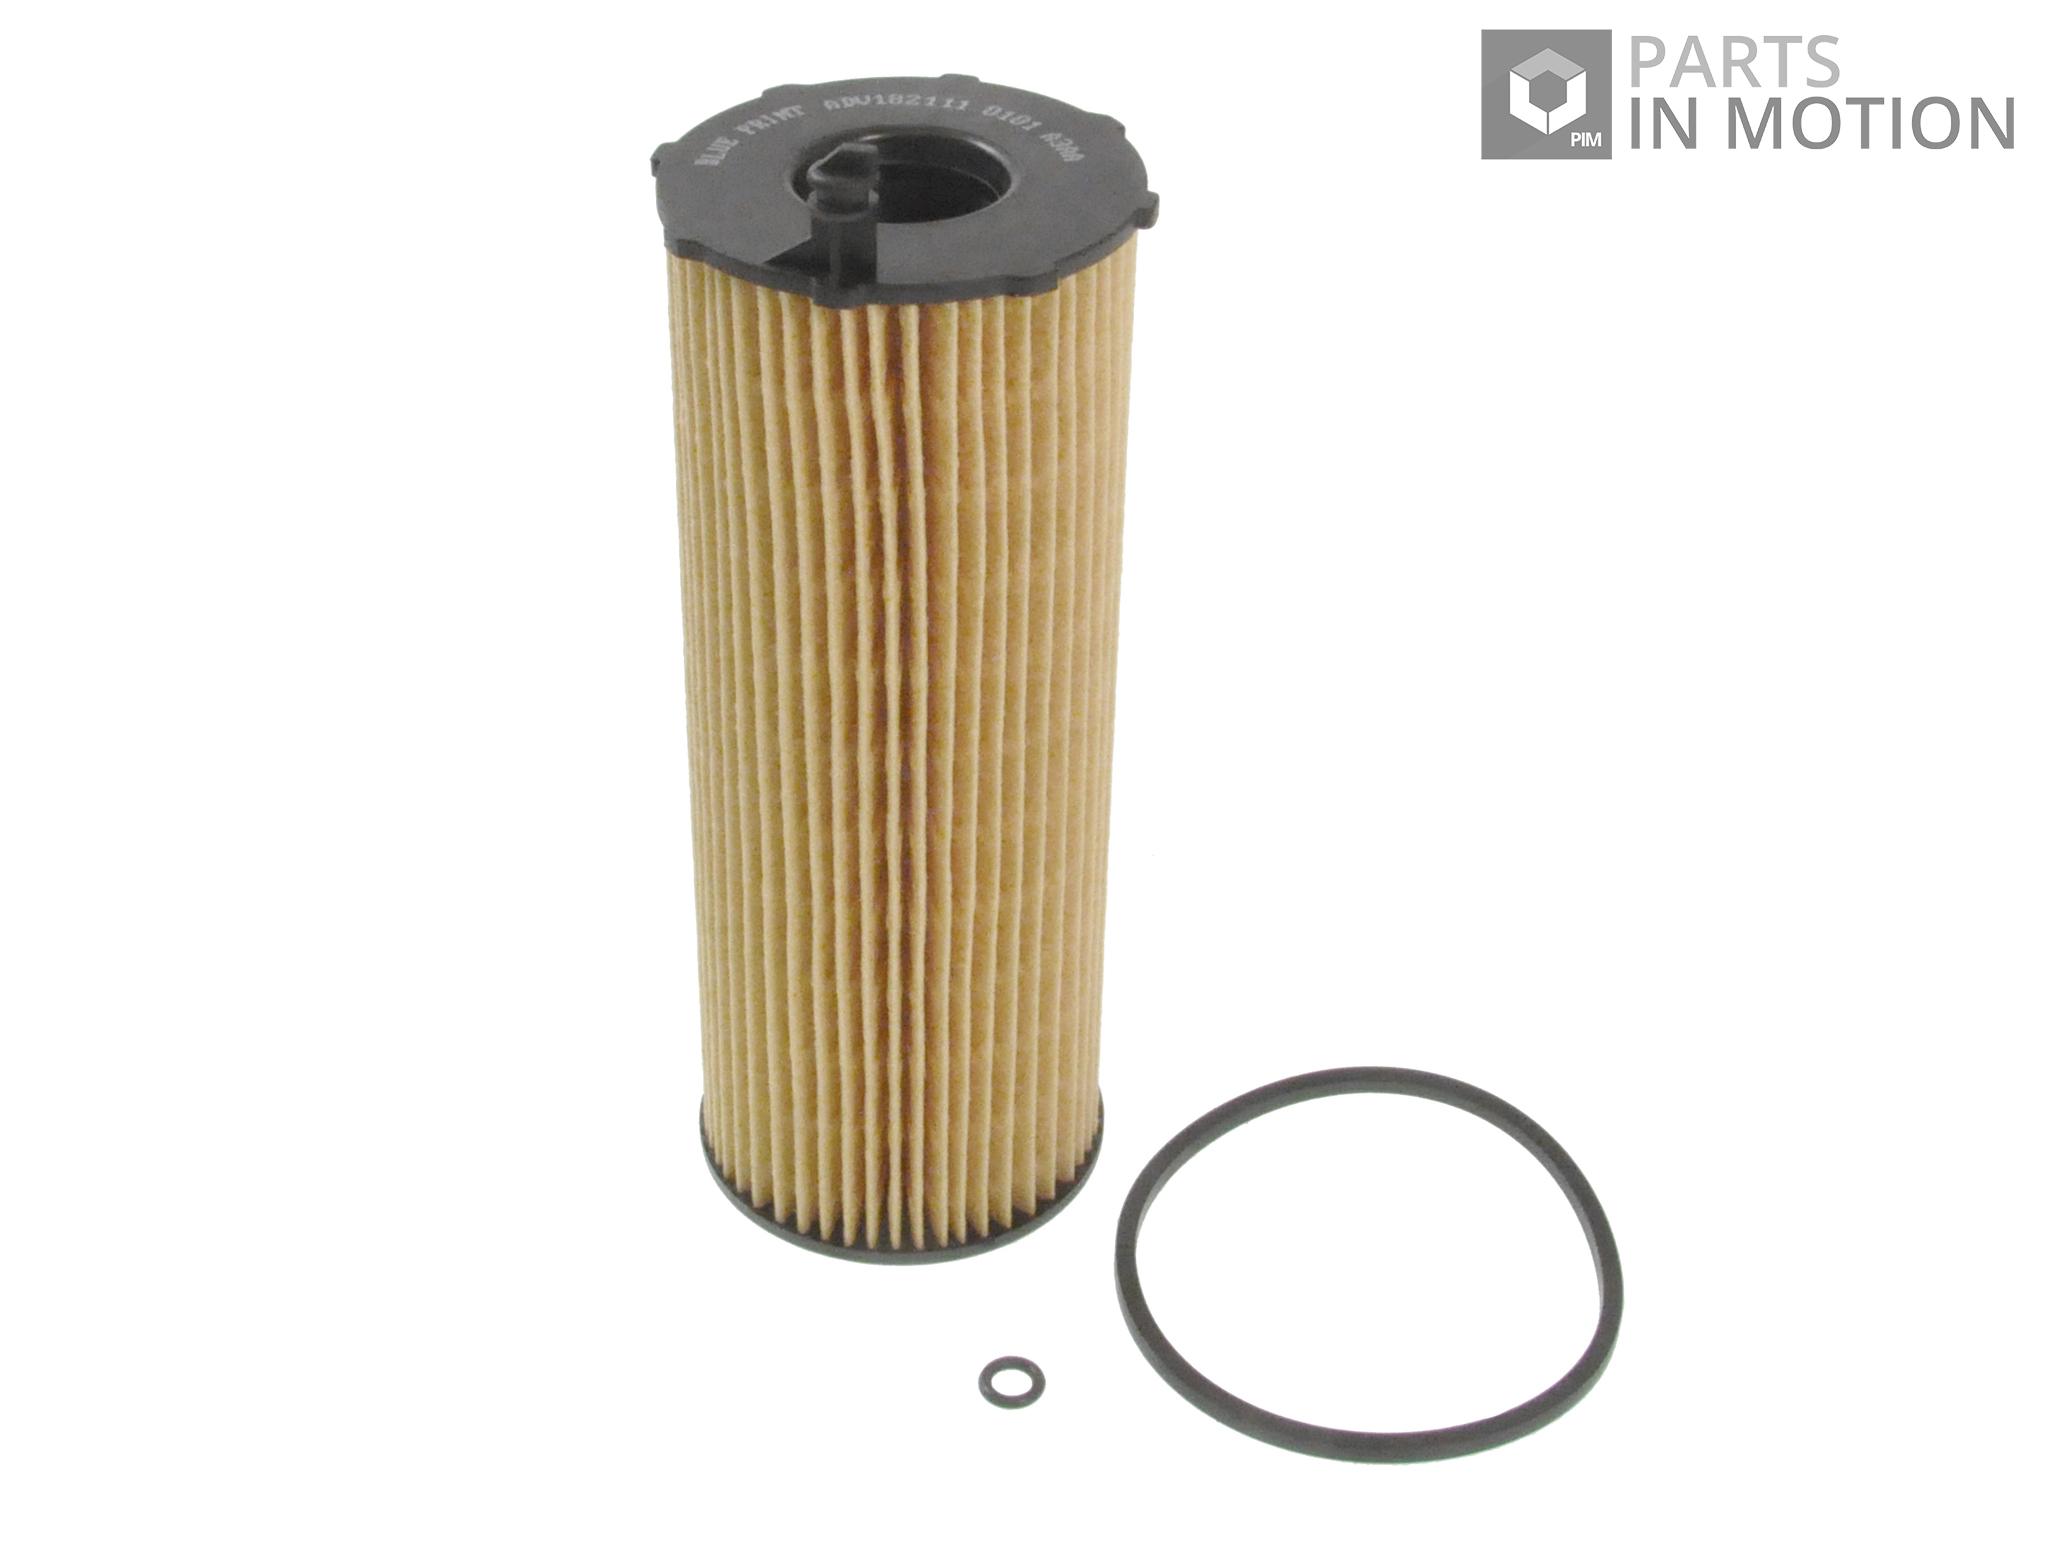 AUDI Q7 4L 3 0D Oil Filter 06 to 15 ADL L Genuine Quality